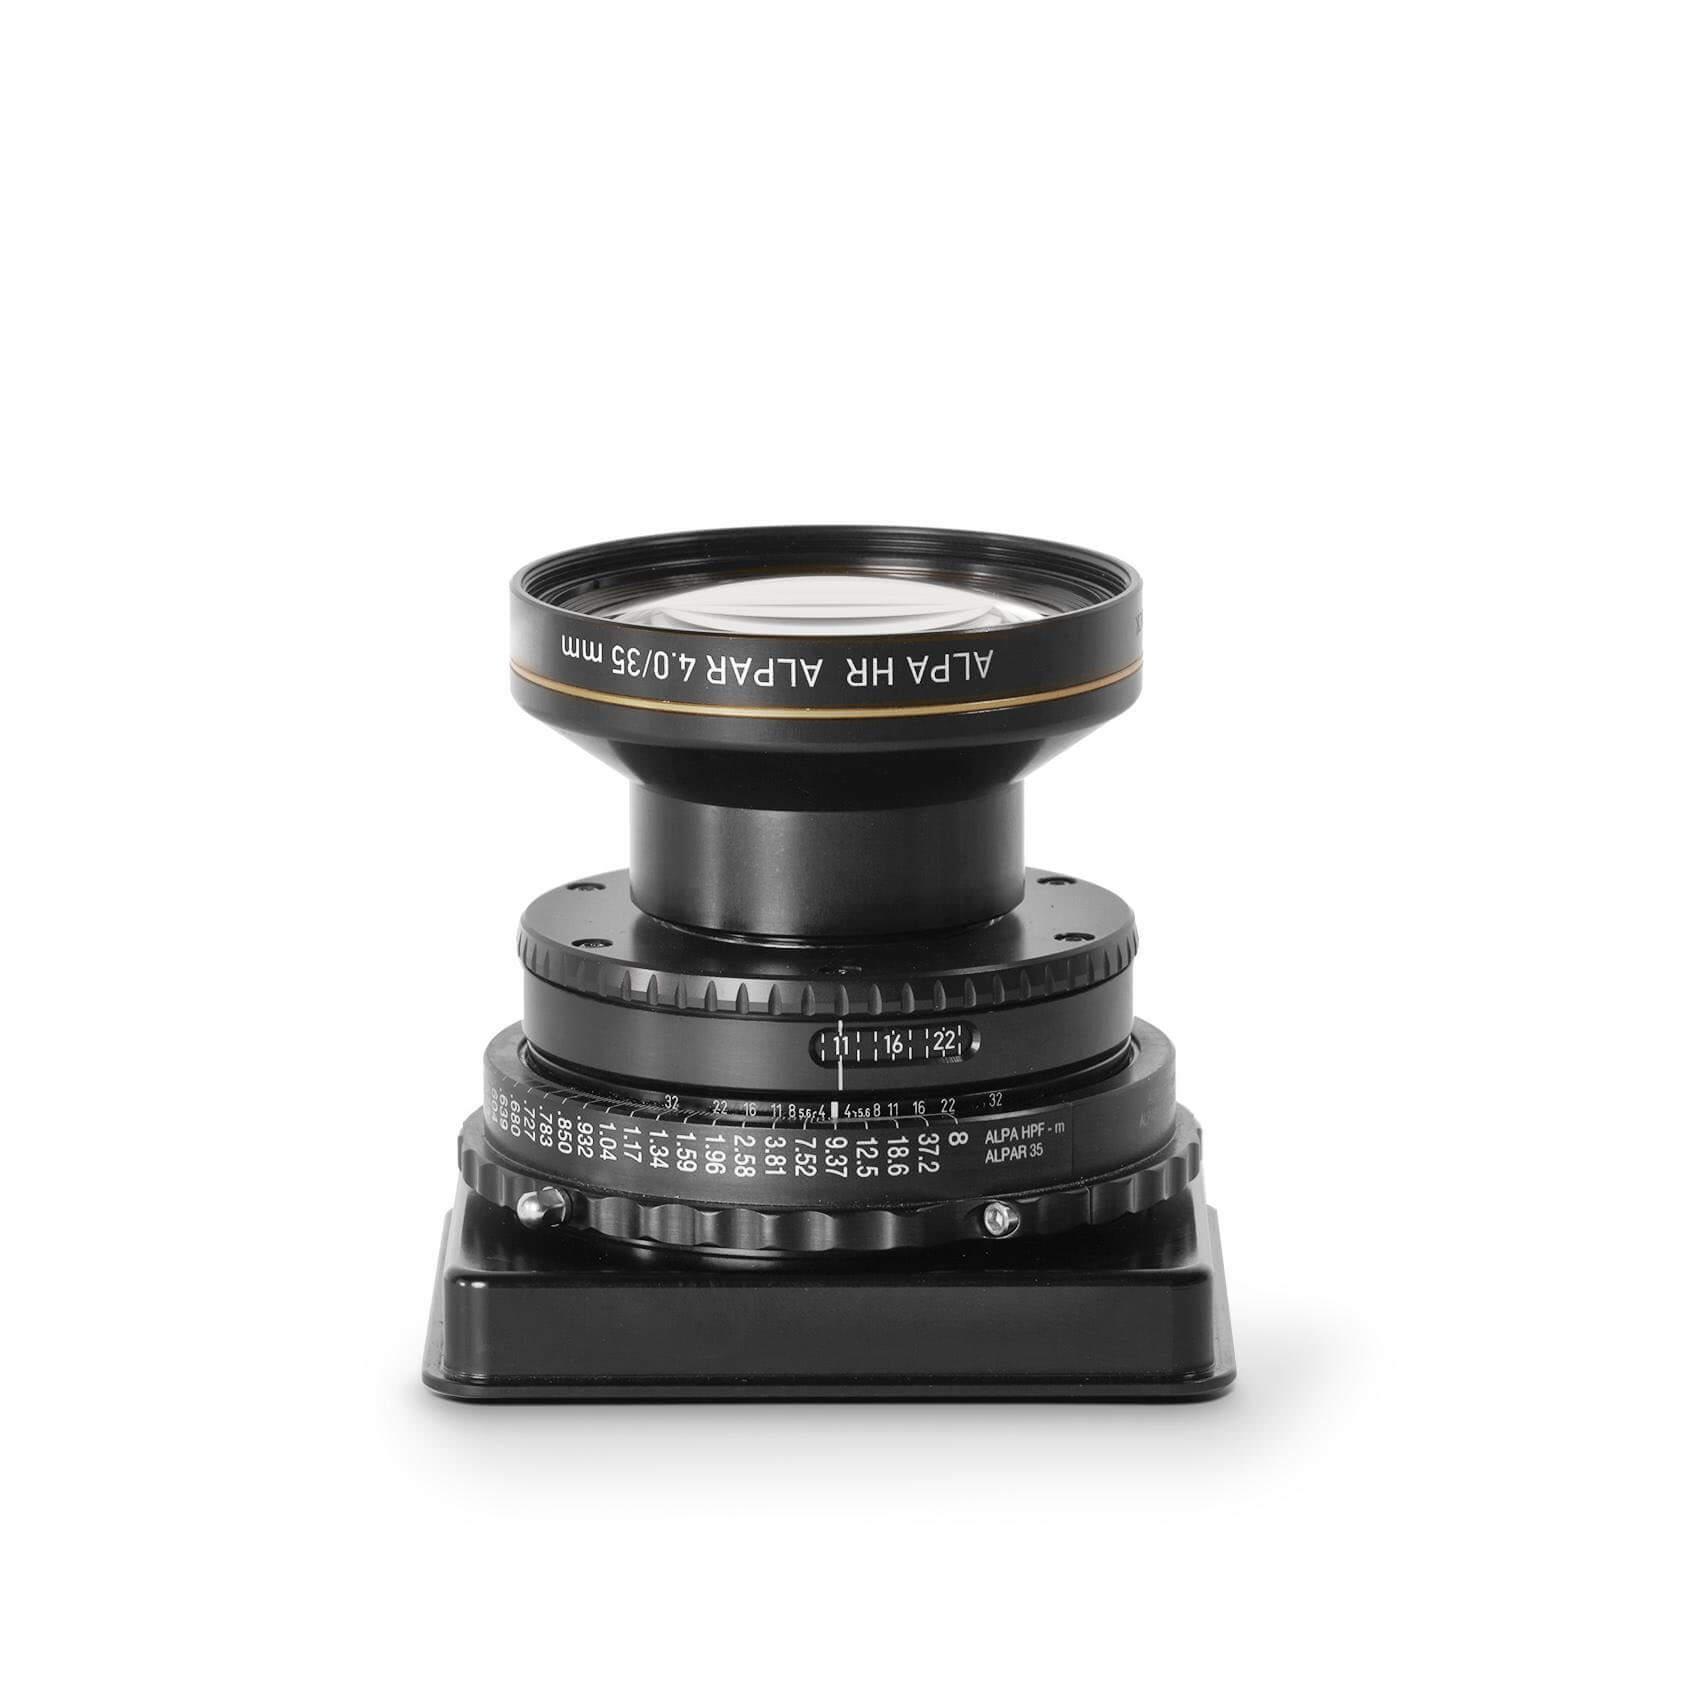 ALPA HR Alpar 4.0/35 mm